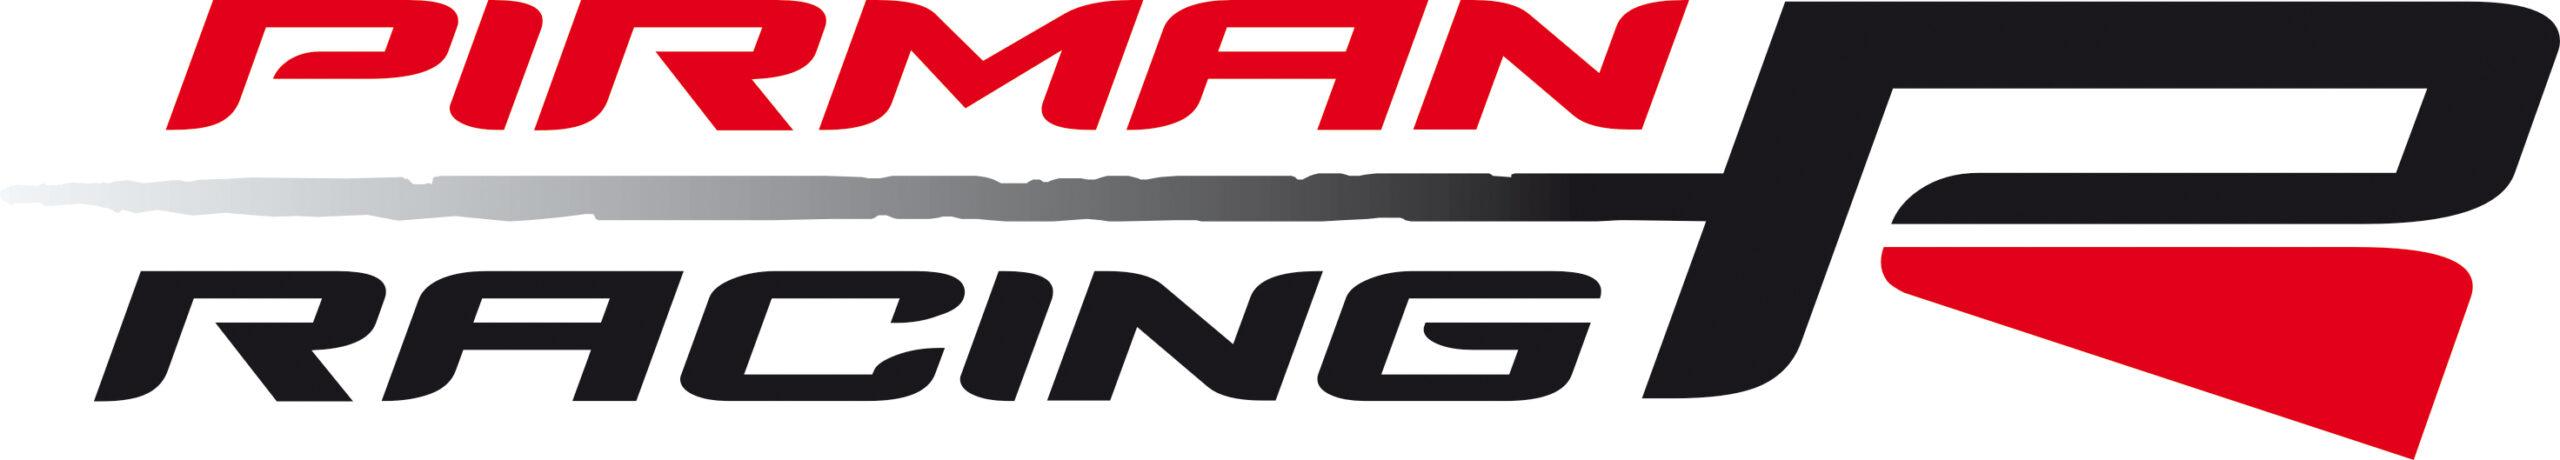 Pirman Racing